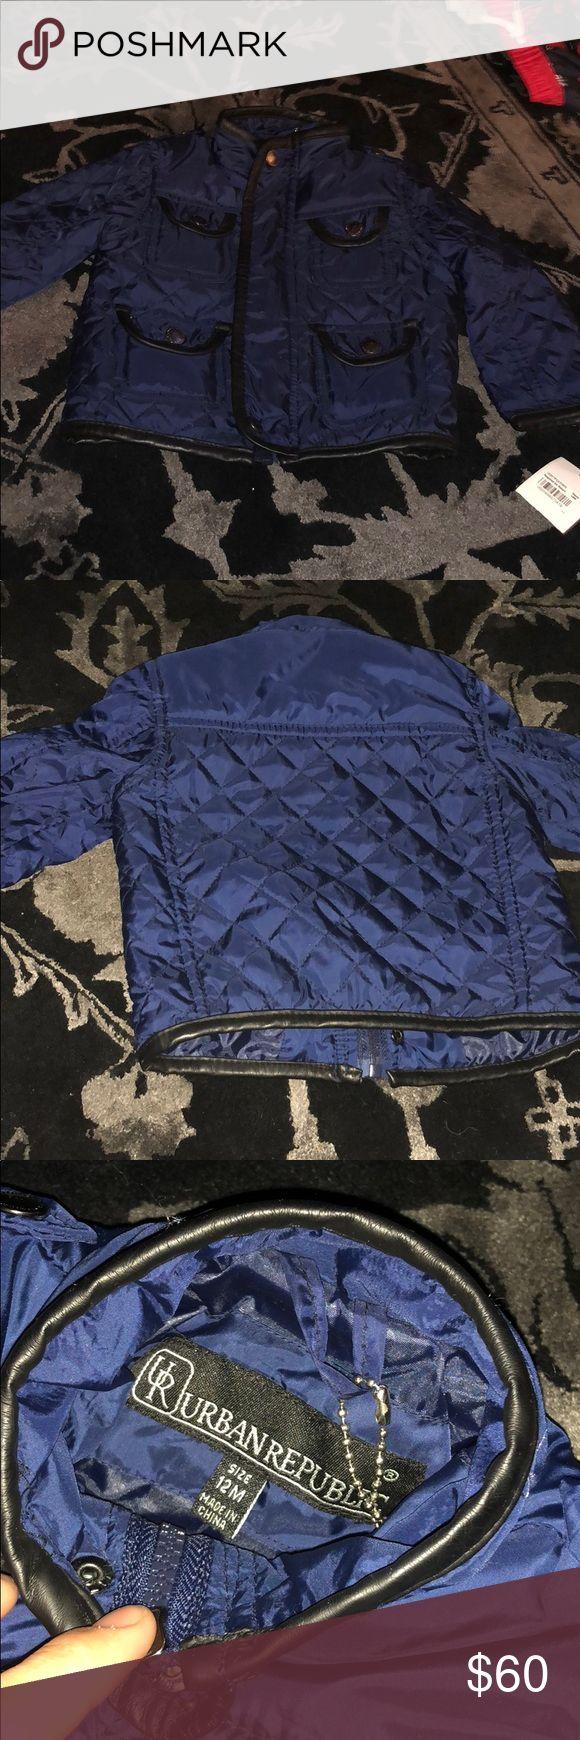 Baby jacket raincoat Baby rain jacket raincoat brand new with tags Bloomingdales Urban Republic Jackets & Coats Raincoats